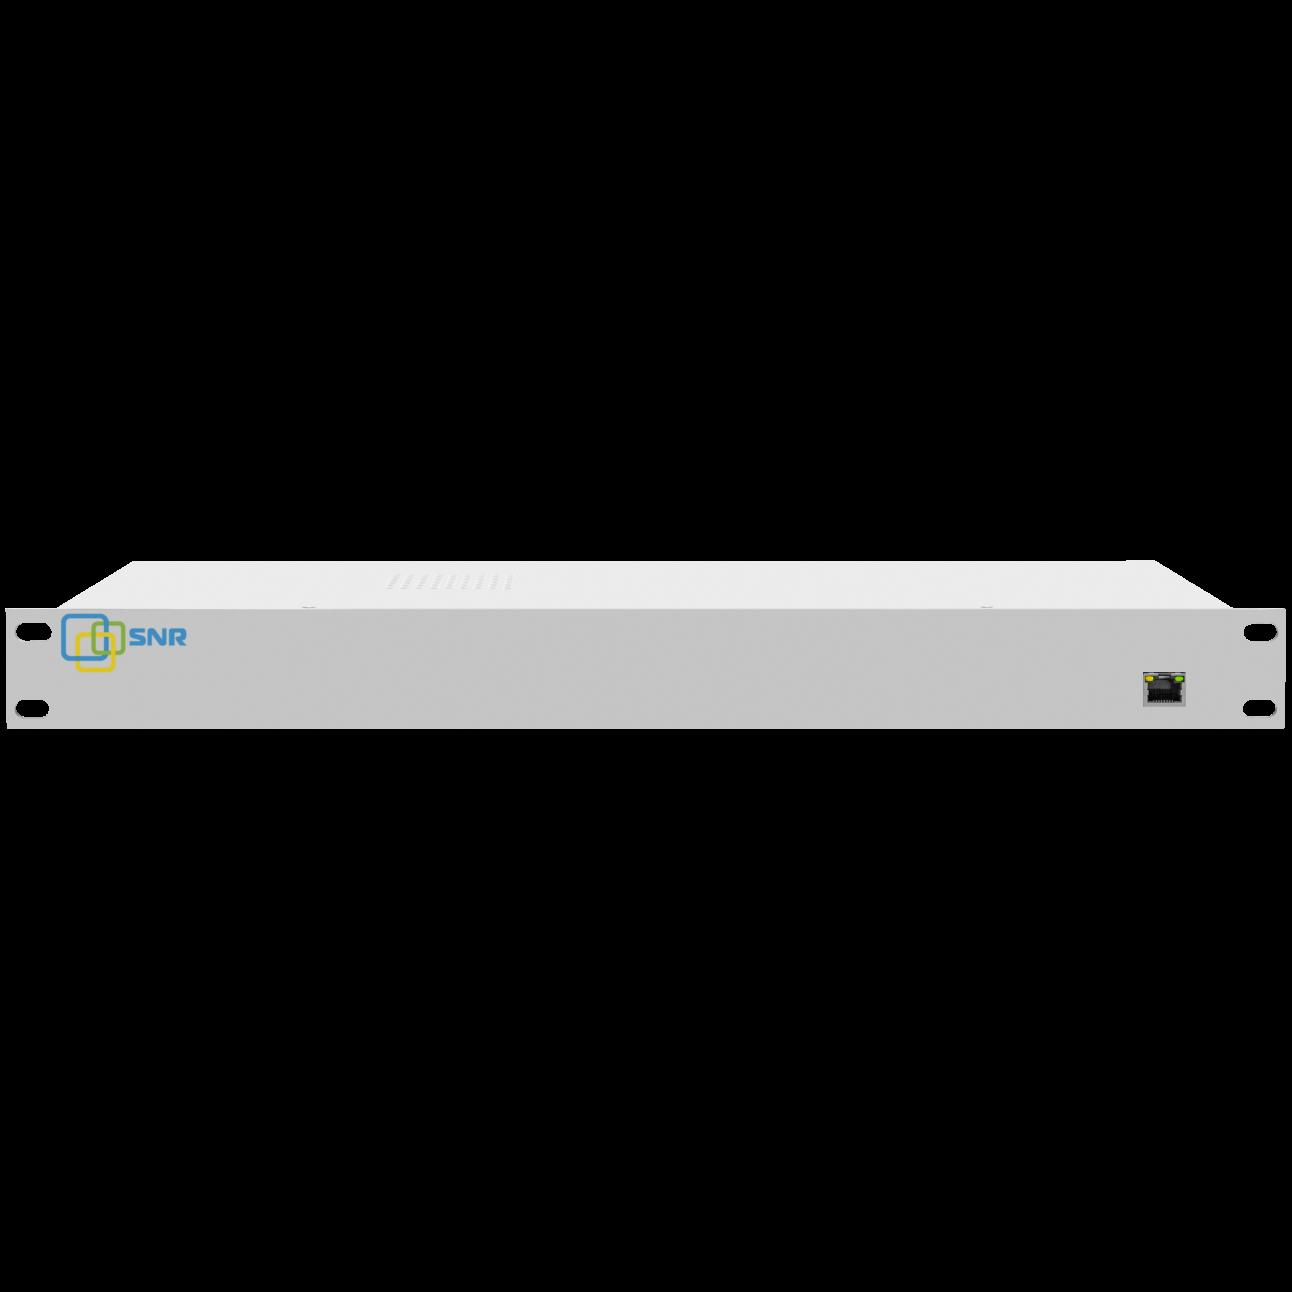 32 канальный DVB-C Модулятор SNR IPQAM-32